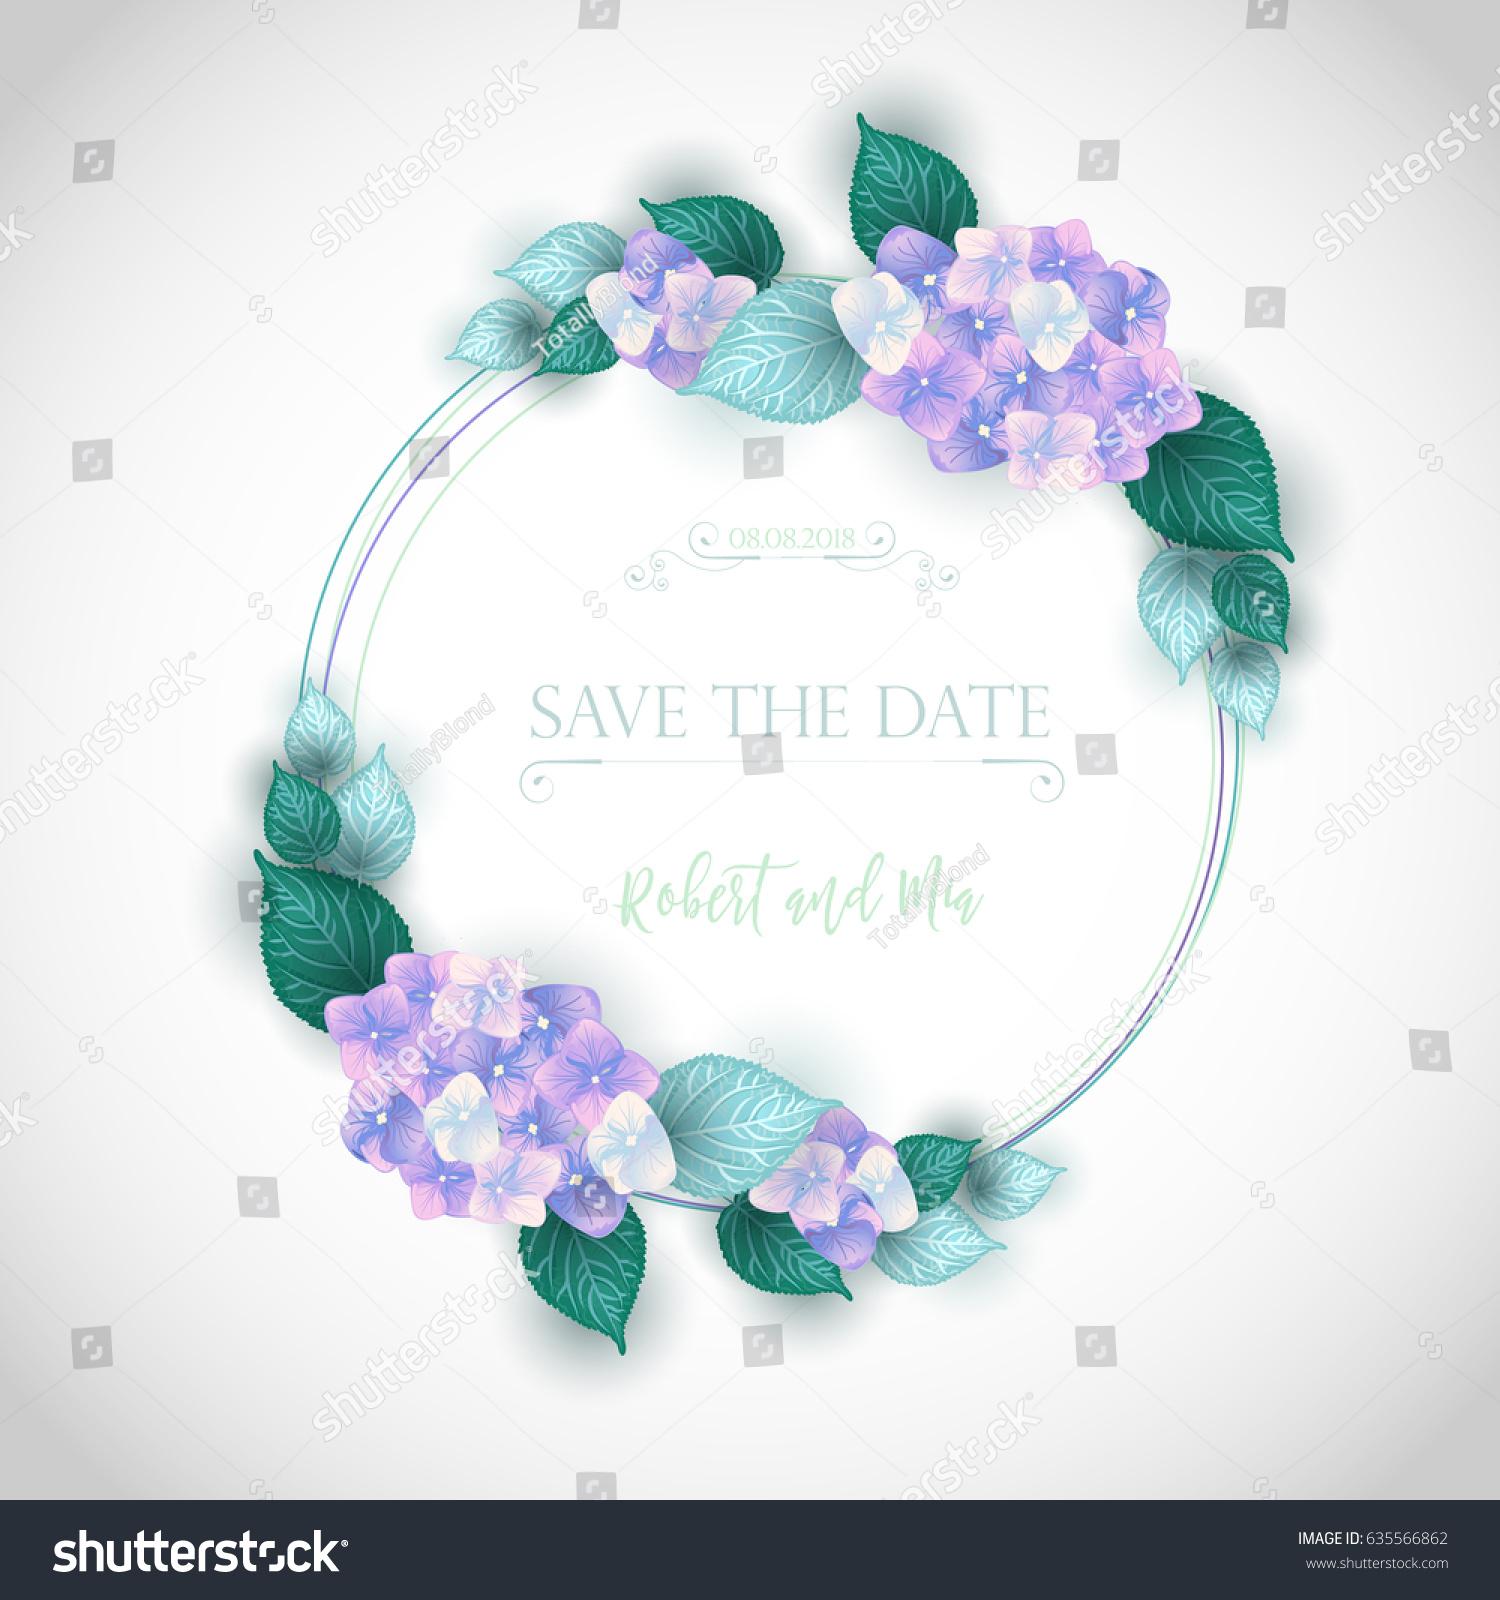 Purple hydrangea wedding invitation sample - Vector Flower Wedding Invitation Card With Purple Hydrangea Frame Romantic Design With Blooming Hand Drawn